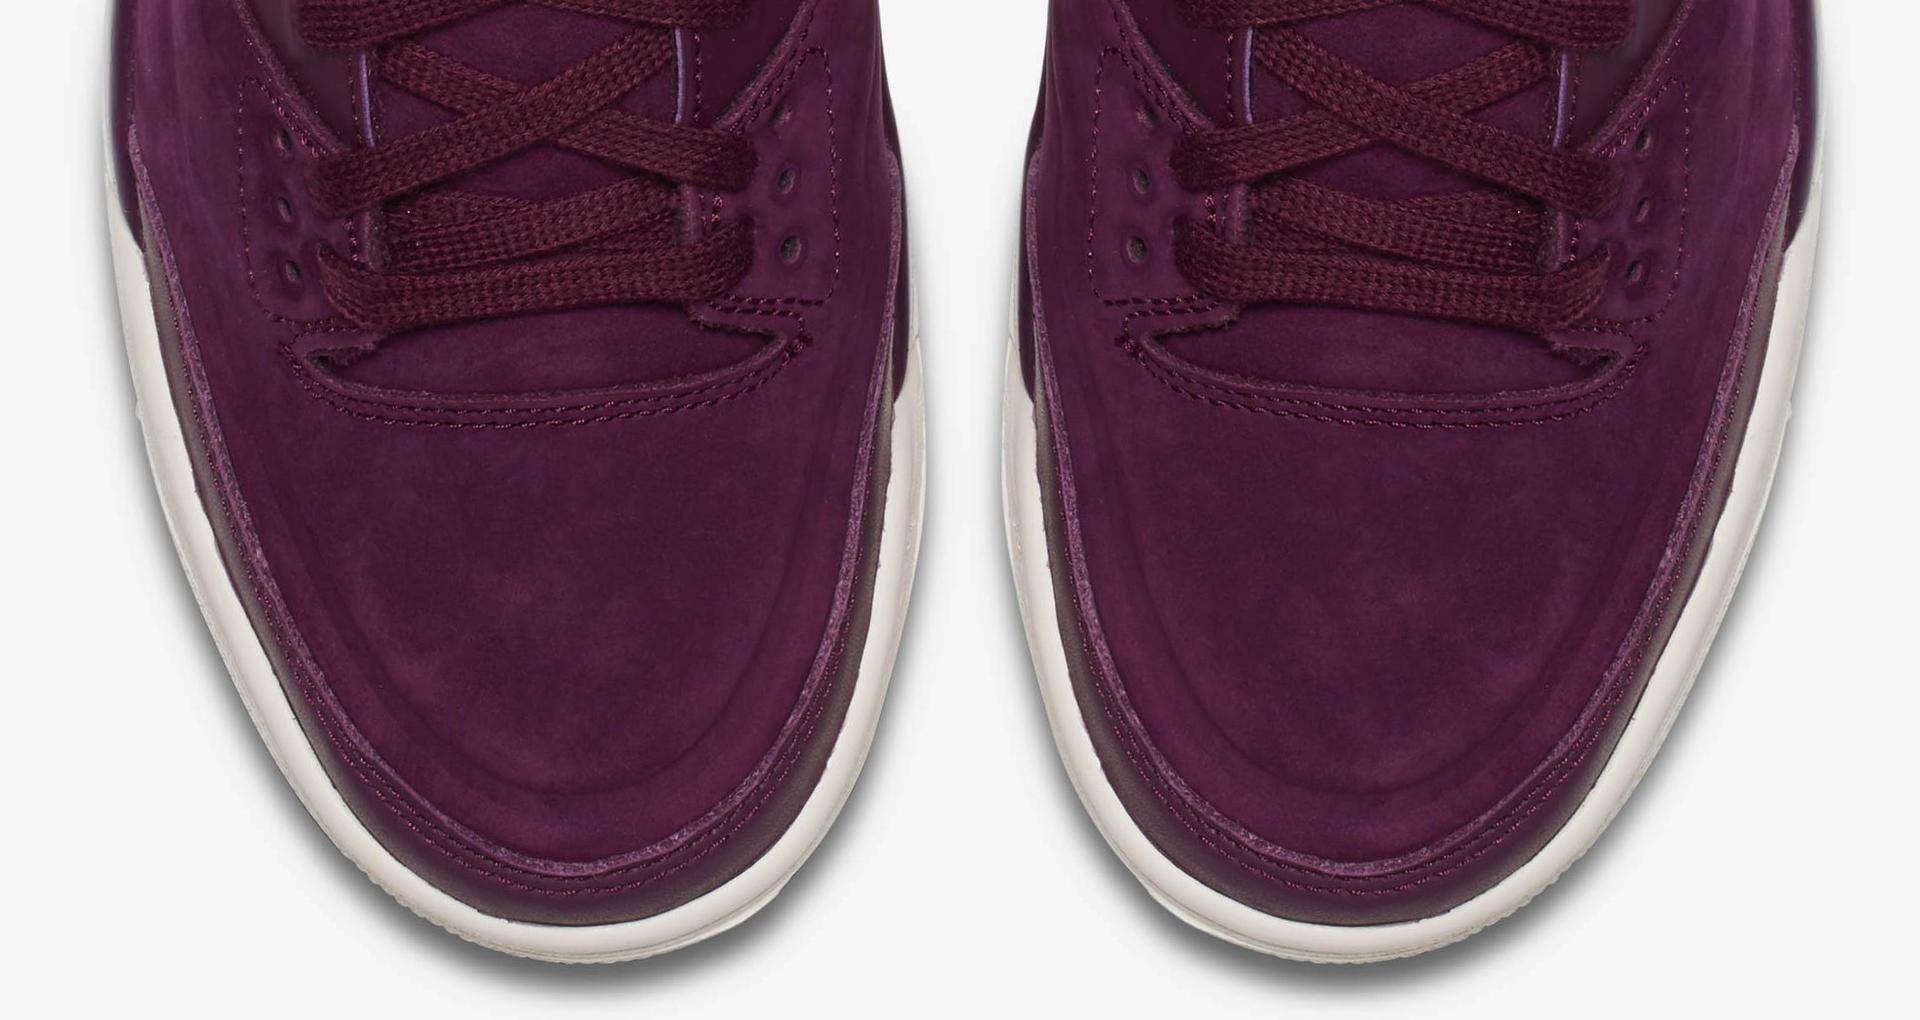 13e7c85fa801 Women s Air Jordan 3  Bordeaux  Release Date. Nike+ SNKRS